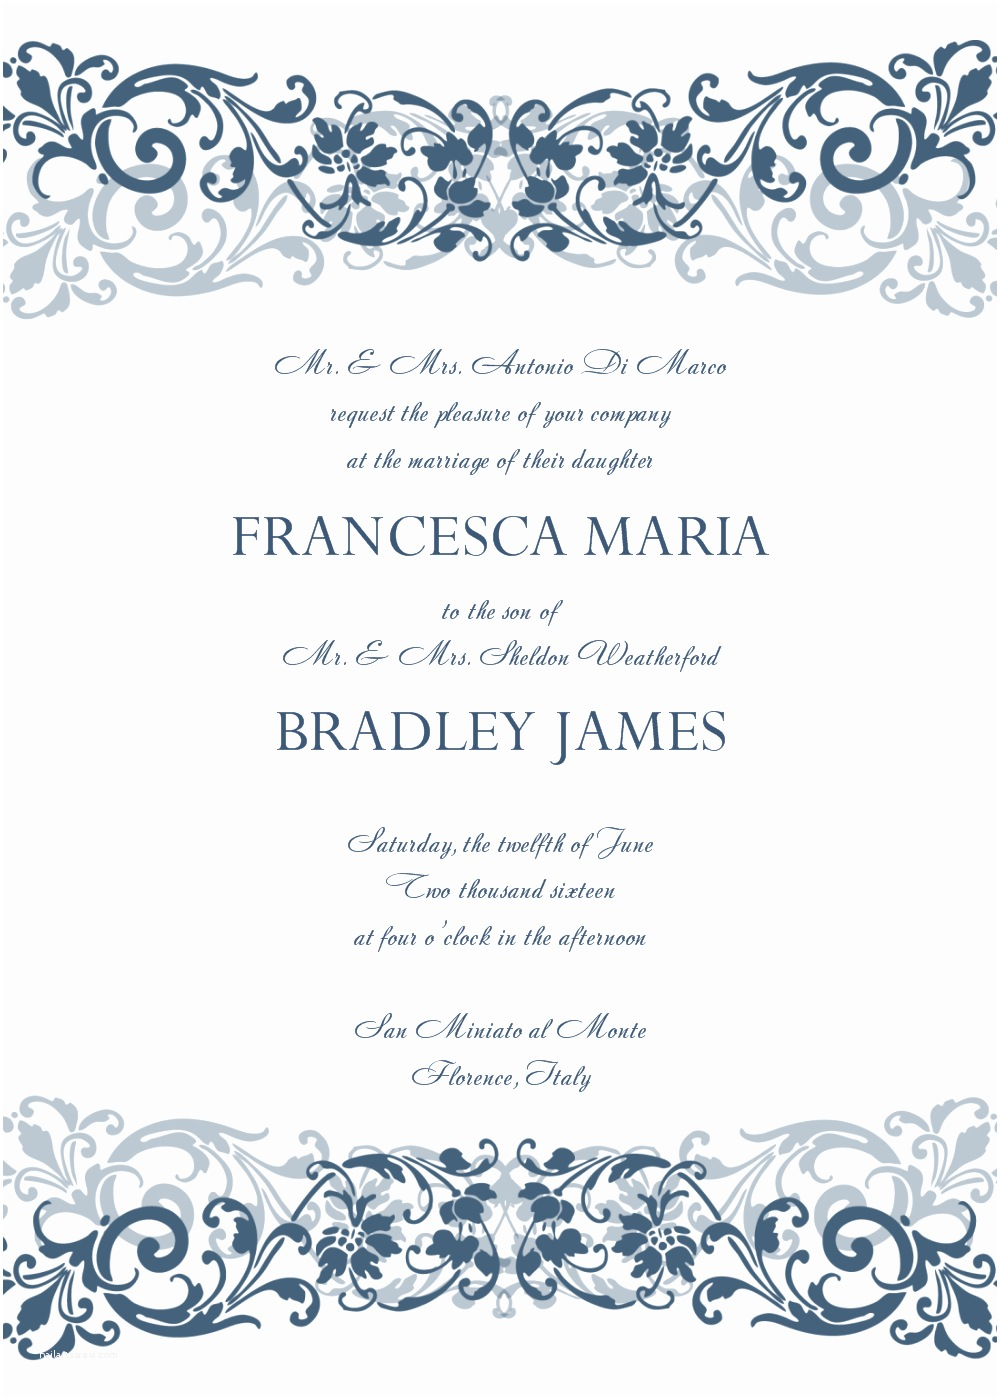 Electronic Wedding Invitations 30 Free Wedding Invitations Templates